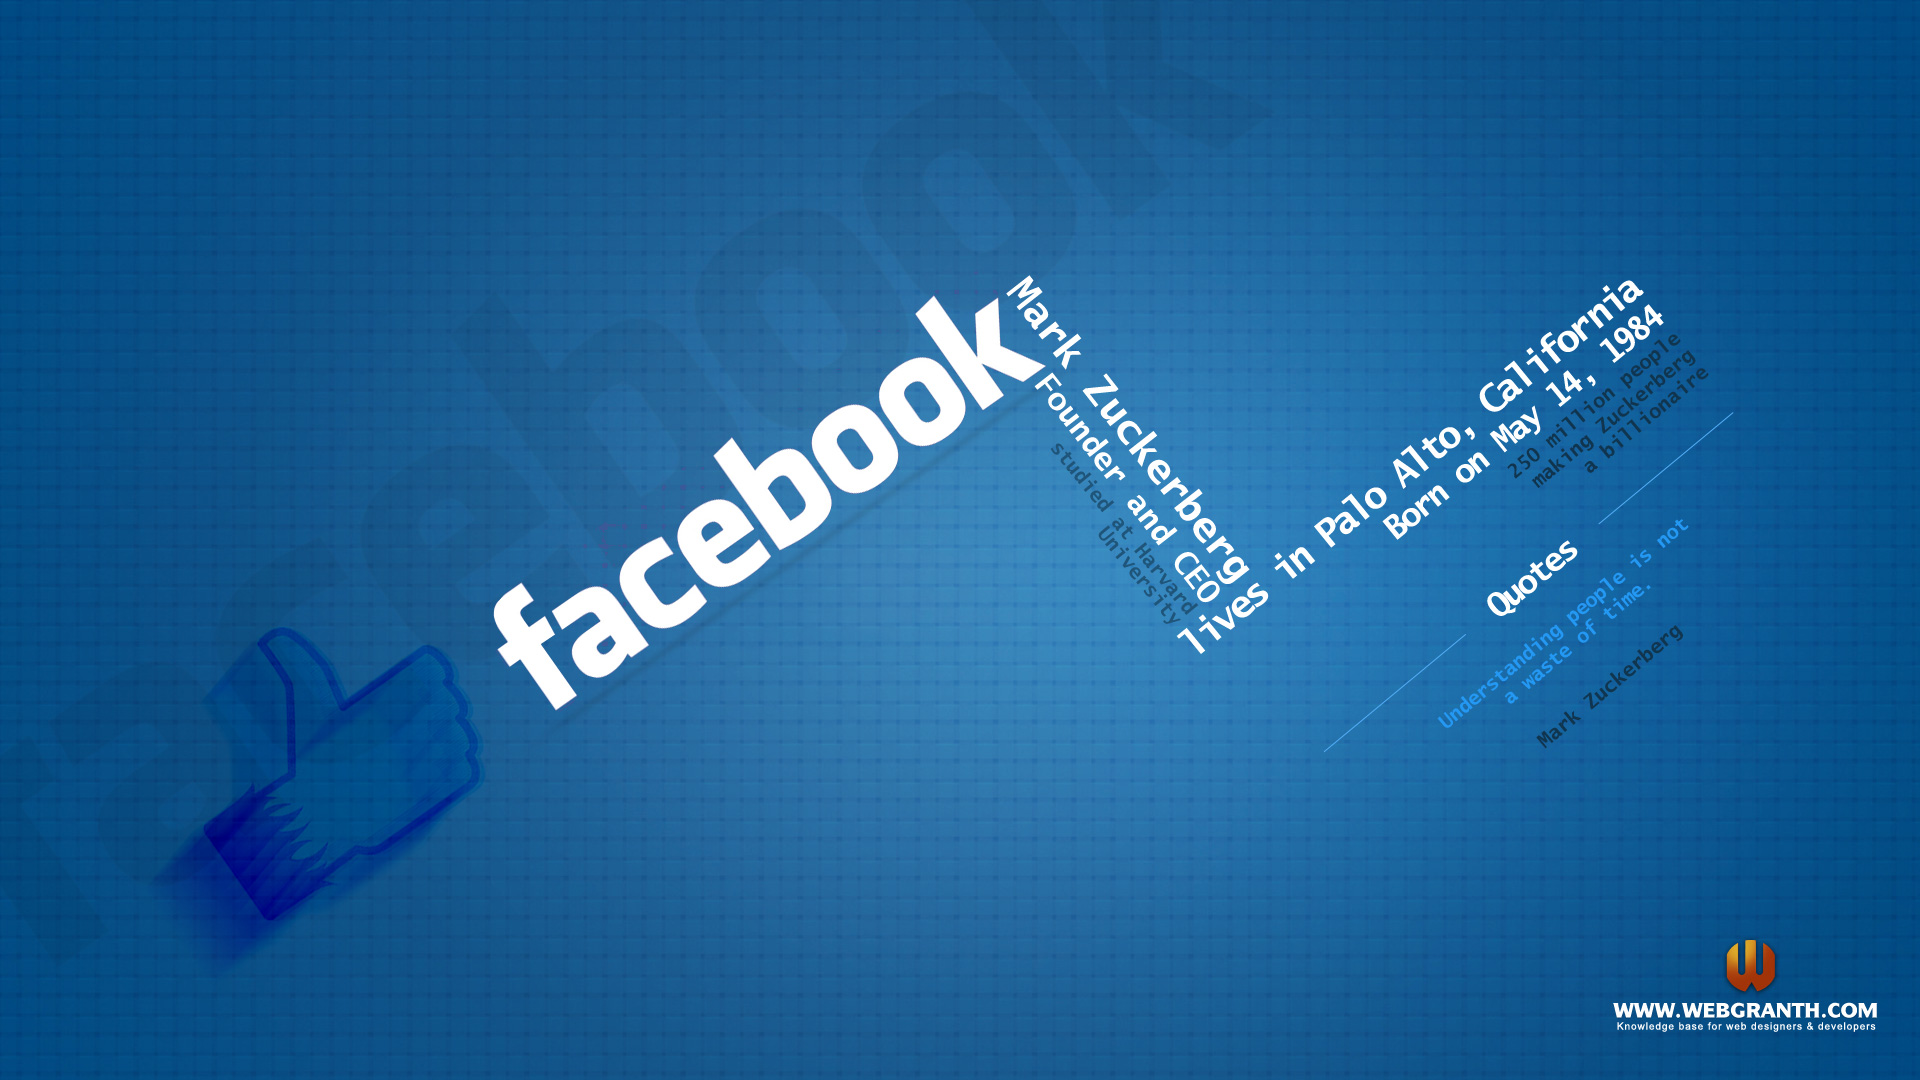 Wallpaper For Facebook Background